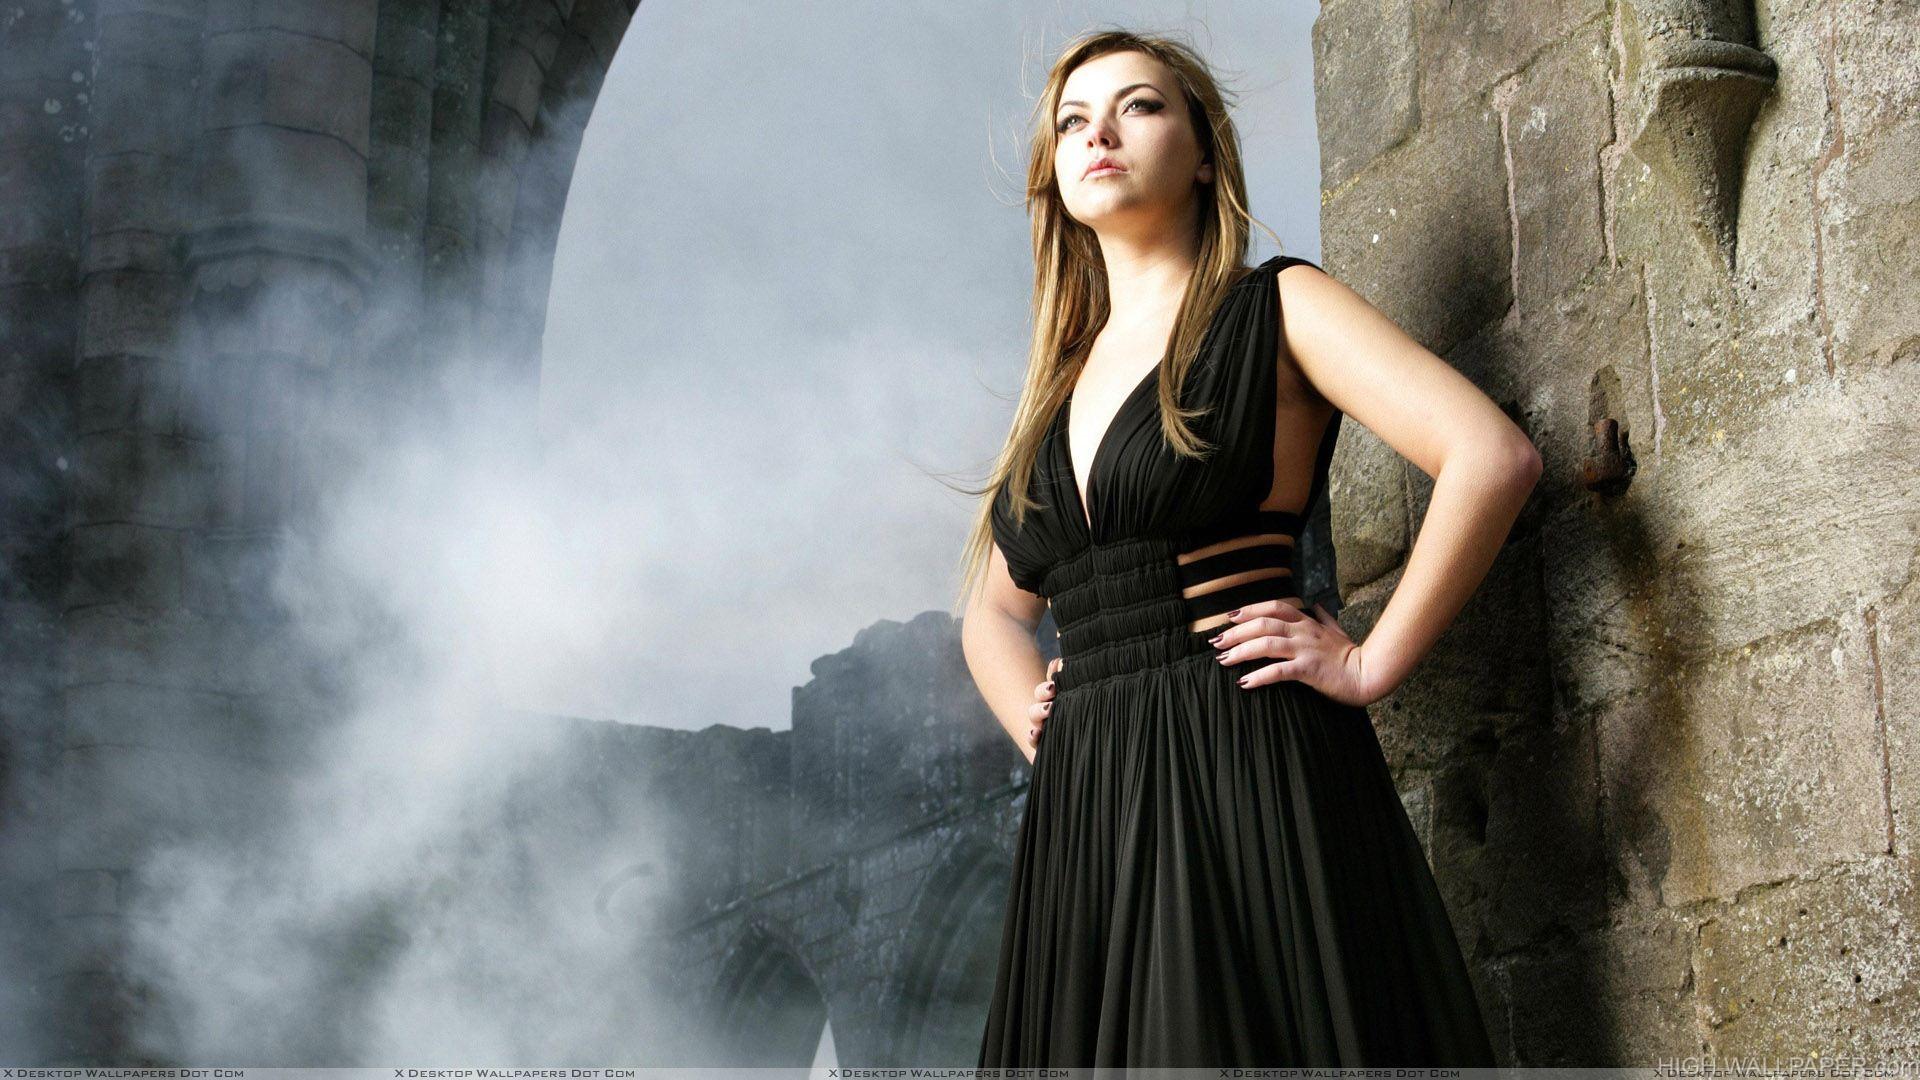 Charlotte Church In Black Dress Modeling Pose